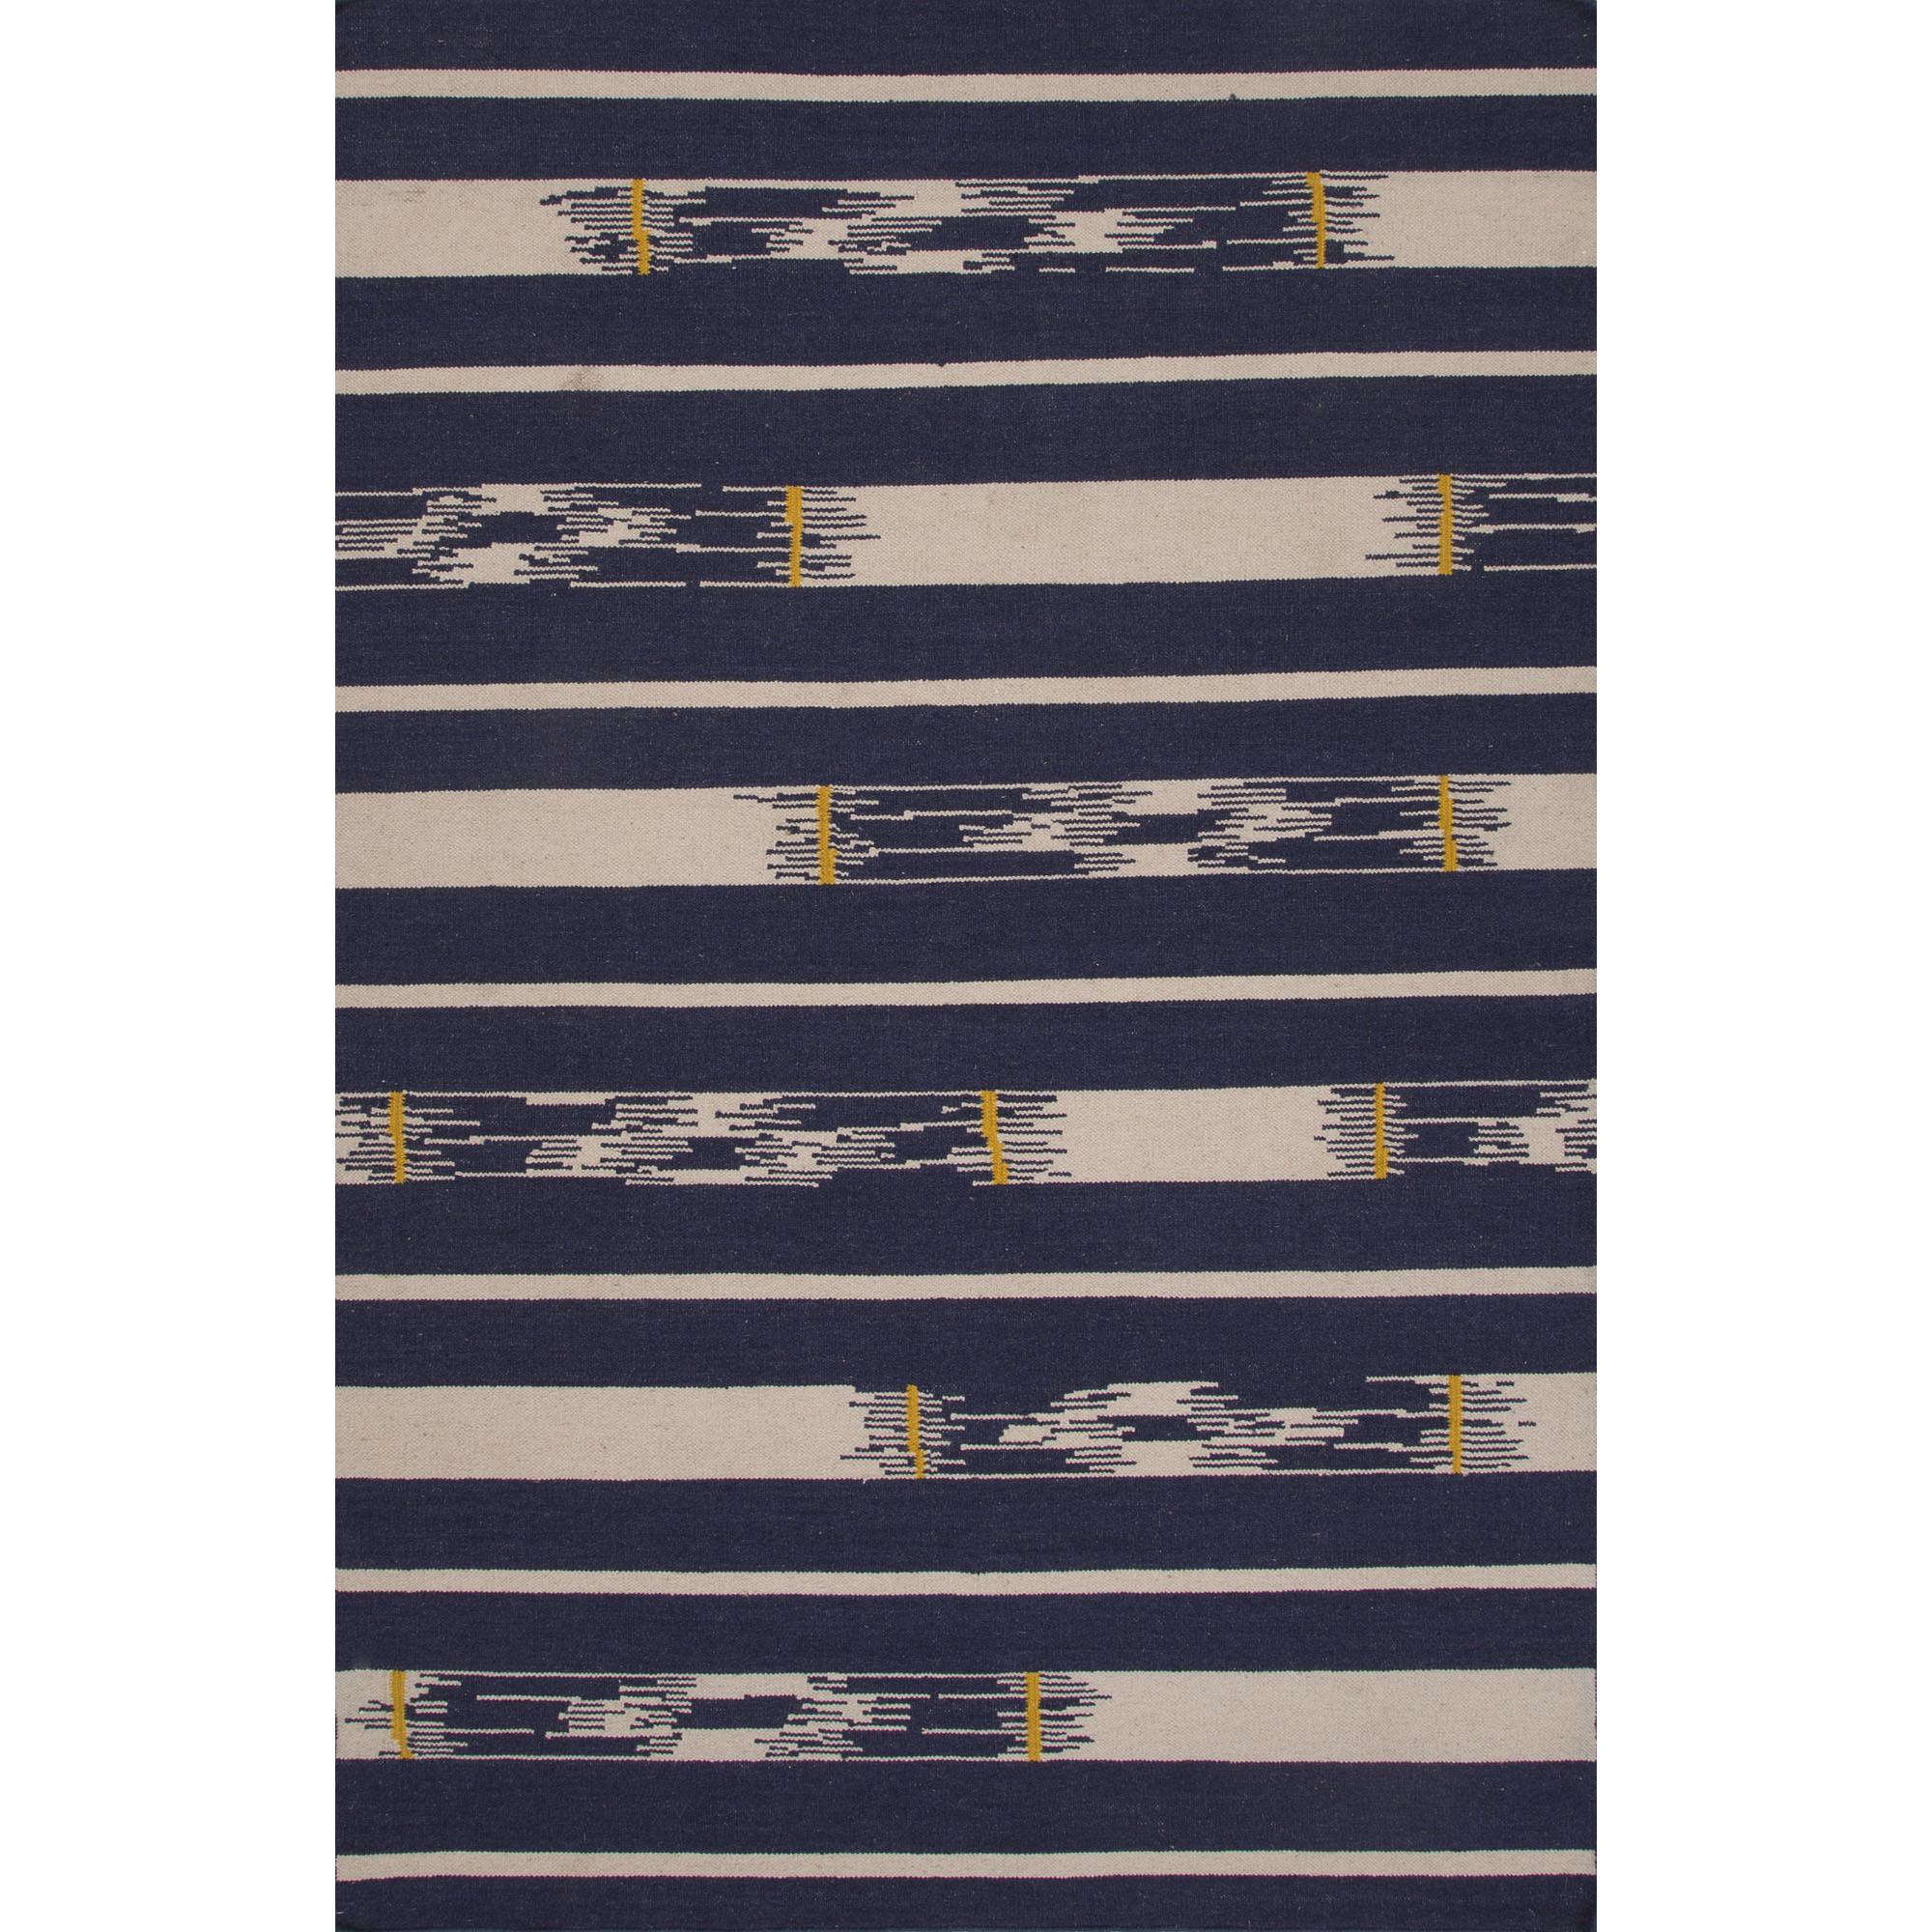 JAIPUR Rugs Traditions Modern Flat Weave 8 x 11 Rug - Item Number: RUG122241